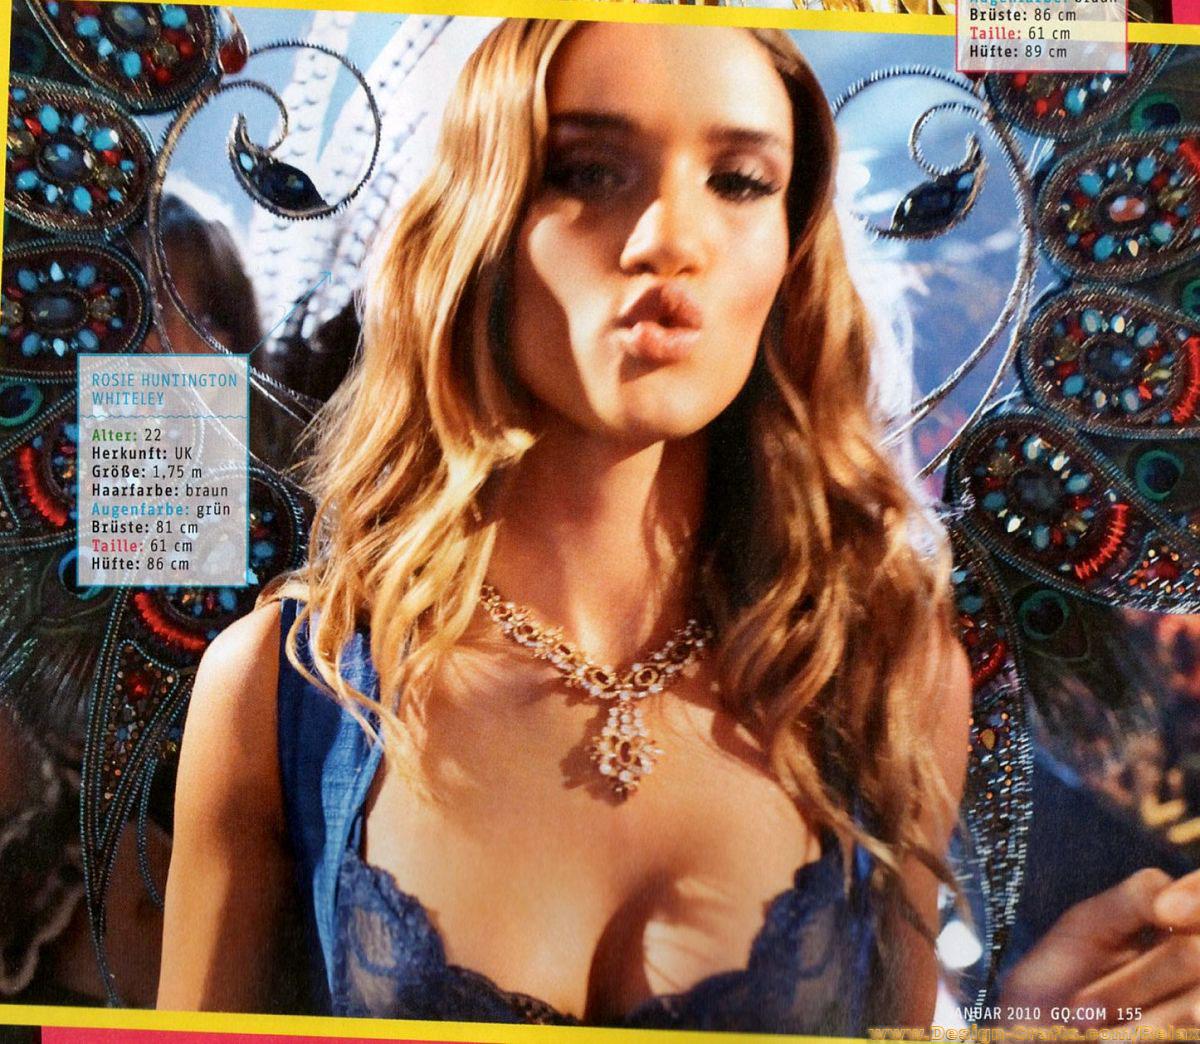 http://3.bp.blogspot.com/_Vyuvx8gQ80c/S9M1kQhEr9I/AAAAAAAABCs/ELm51yIwCBQ/s1600/victorias-secret-gq-germany-14.jpg